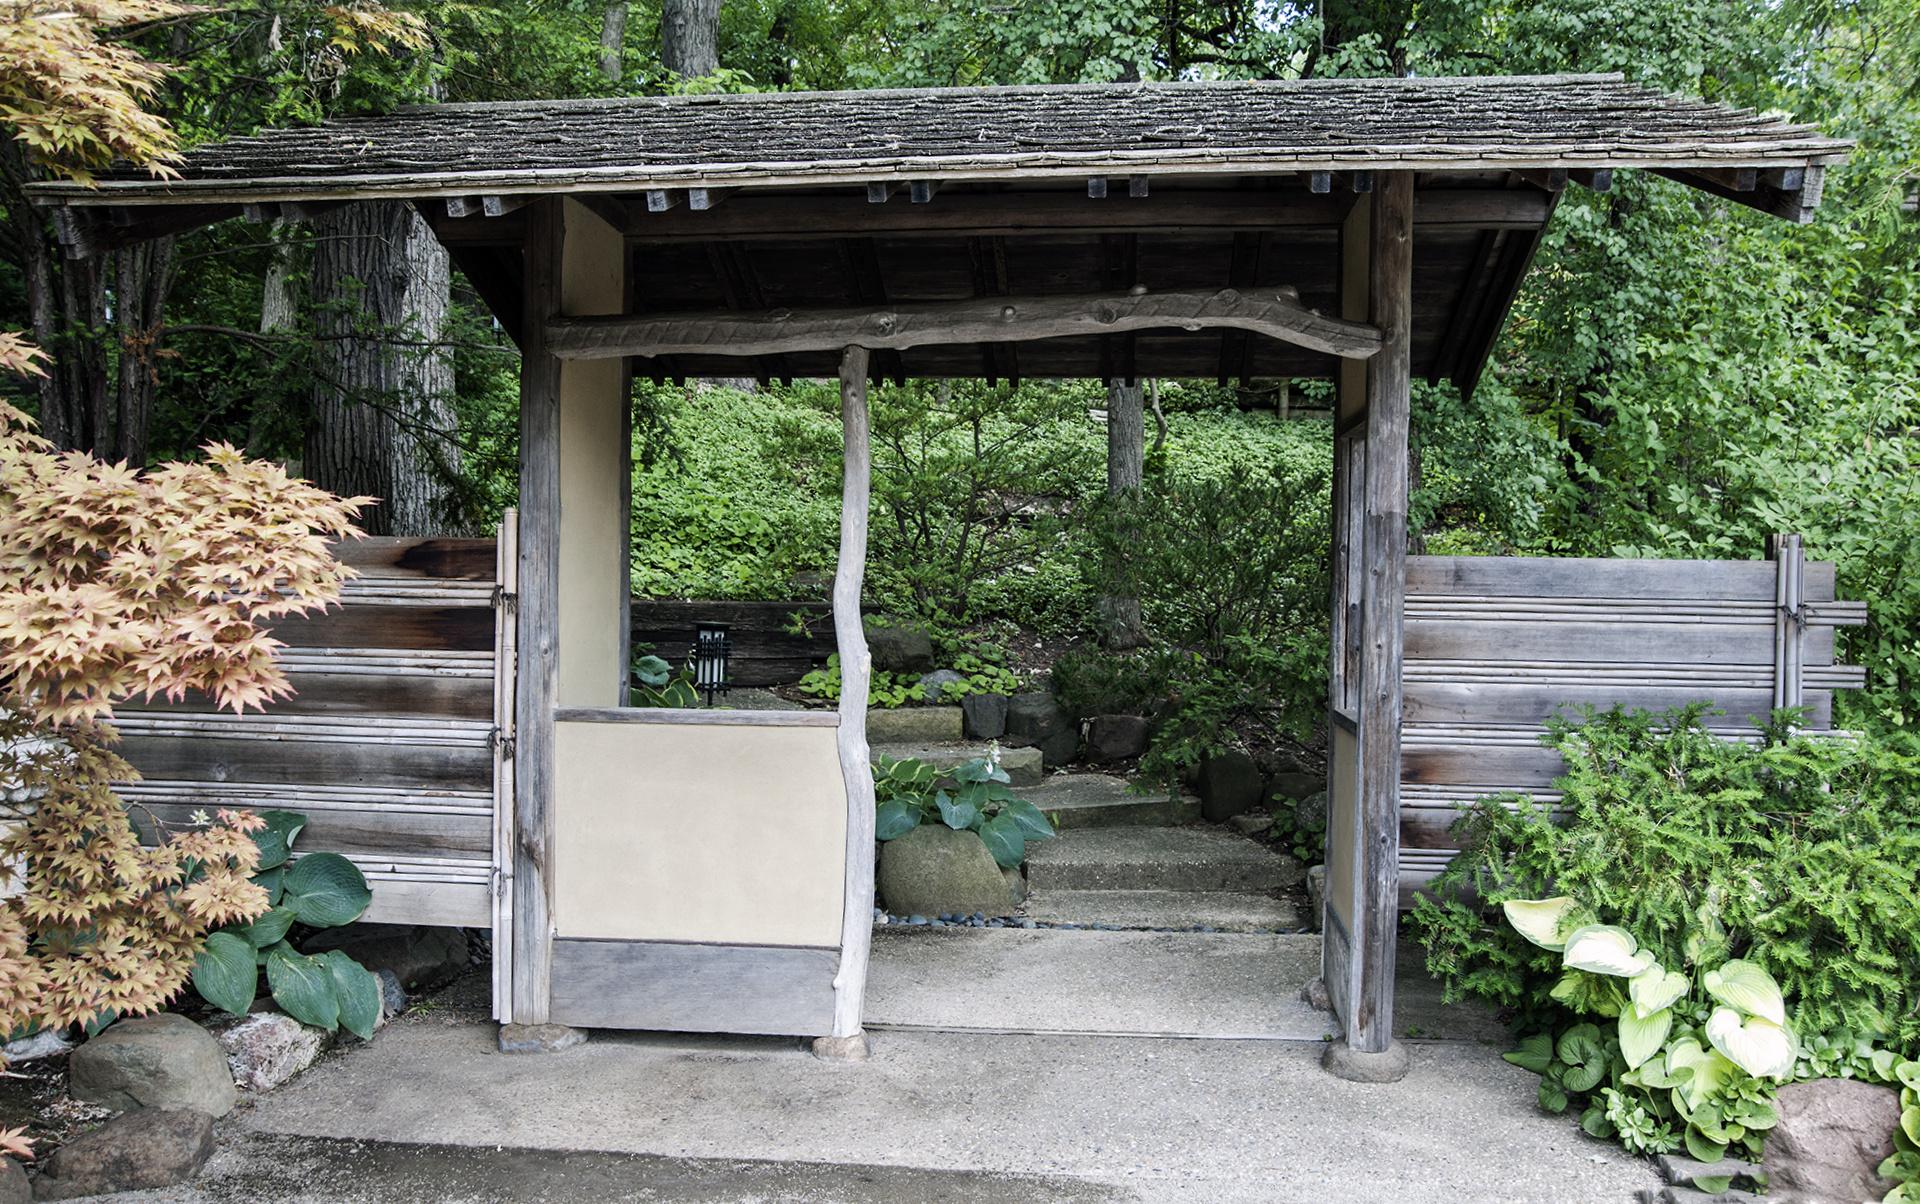 Japanese Garden Structures Hoichi Kurisu Us Japanese Gardens